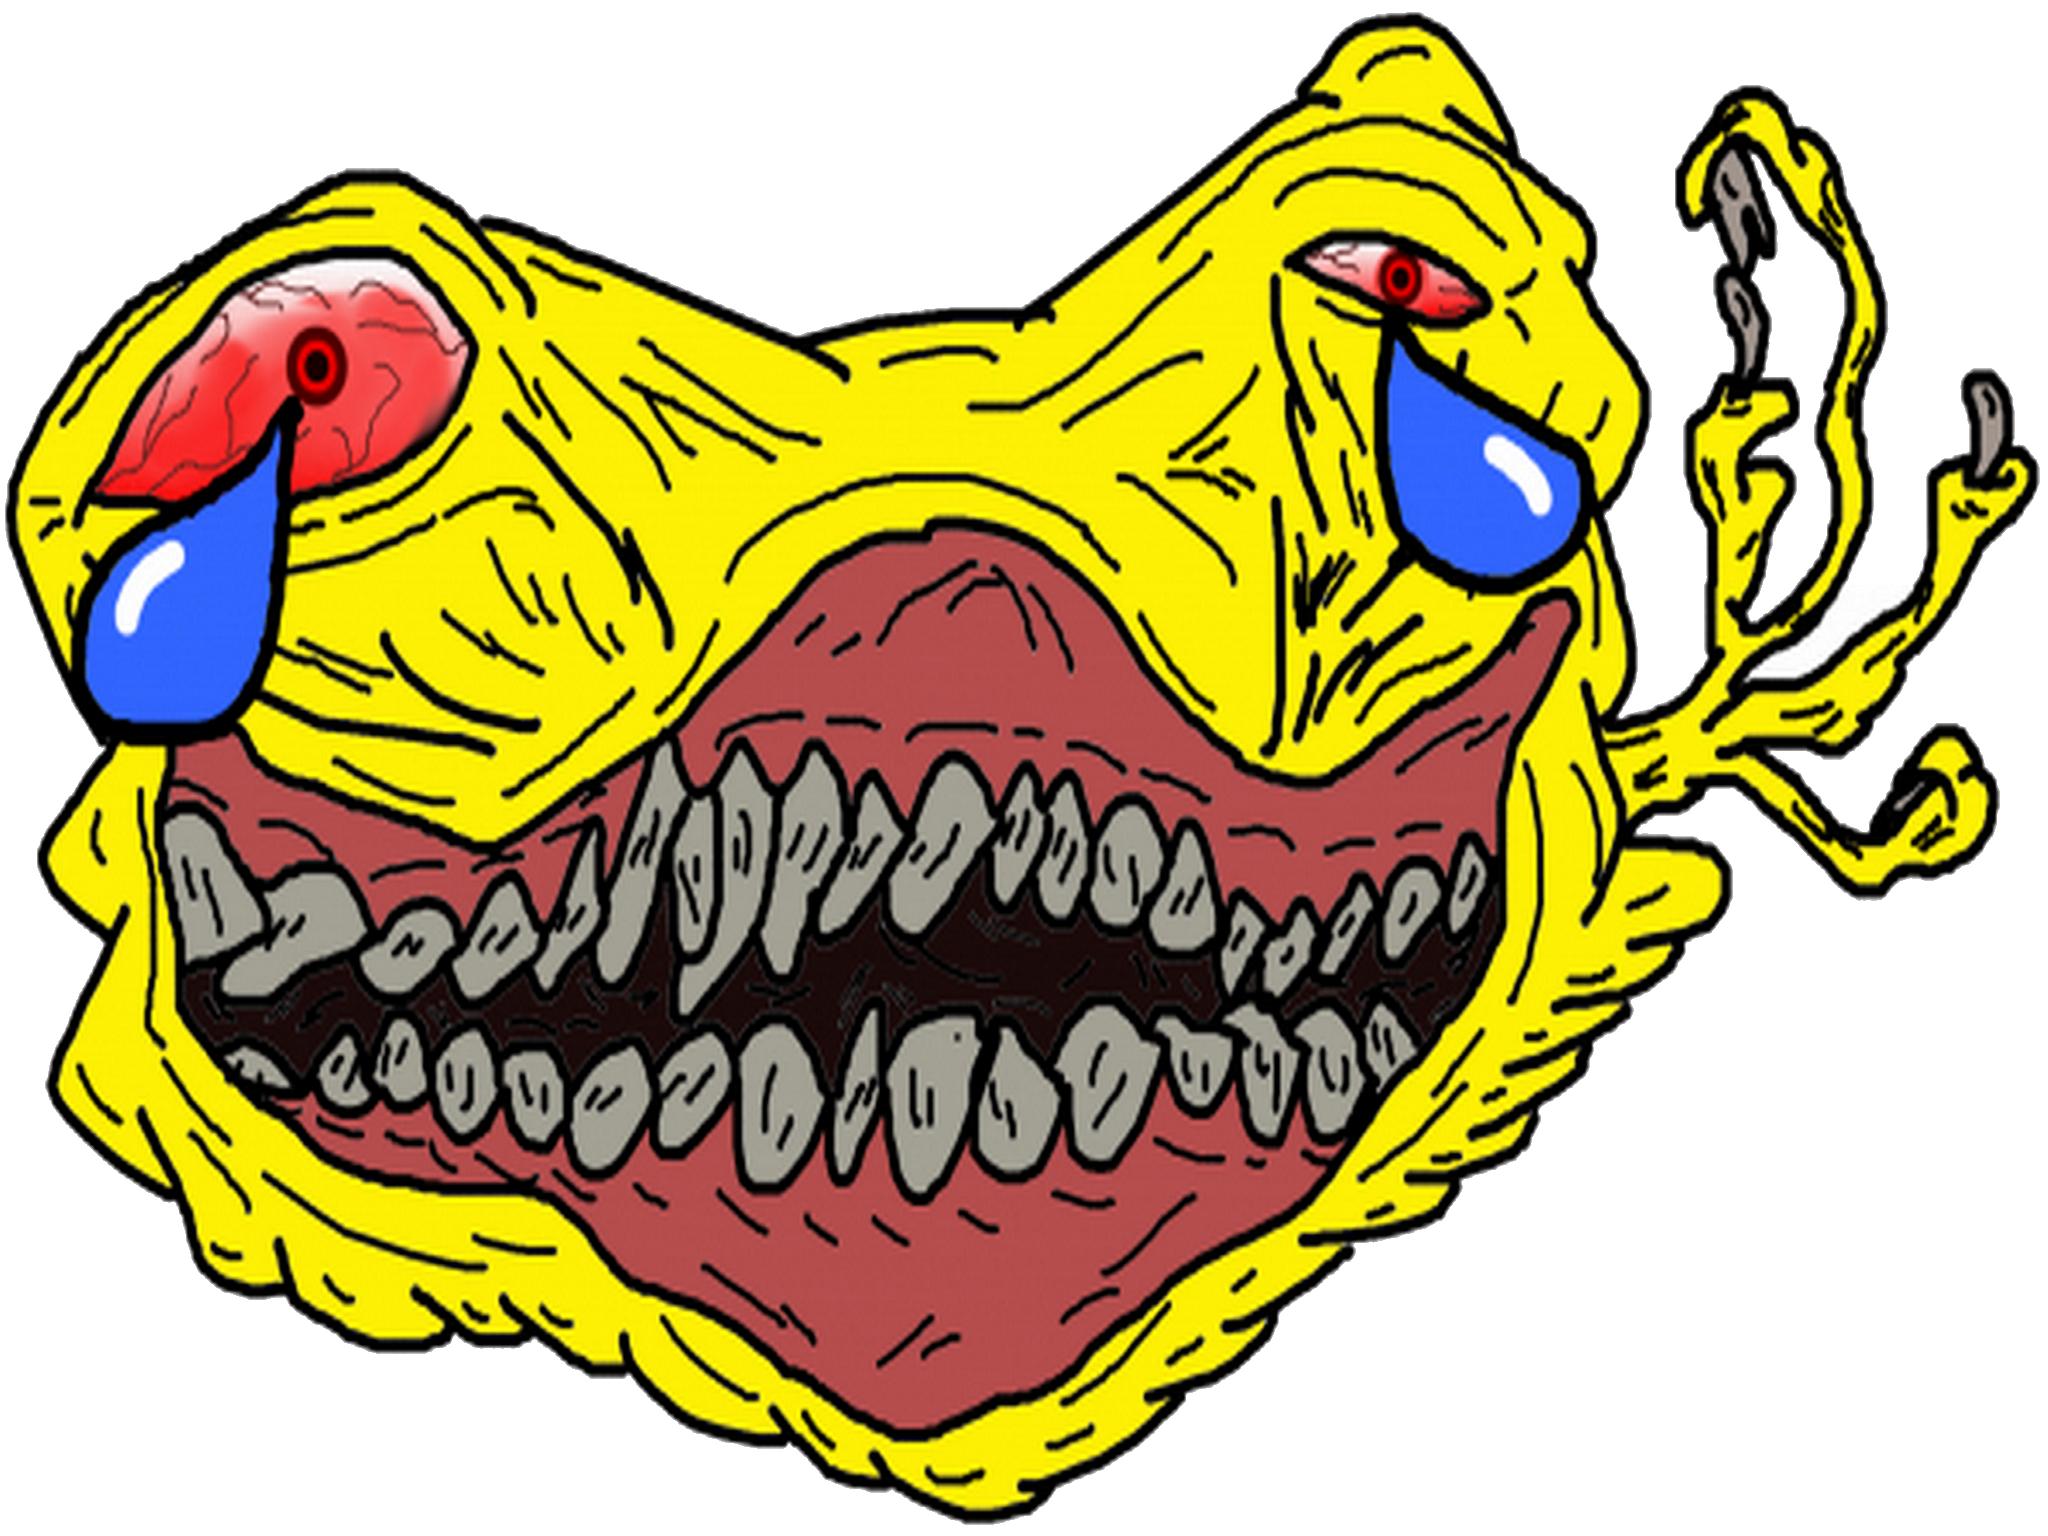 Sticker jvc stickers jpp eco monstre difforme omg